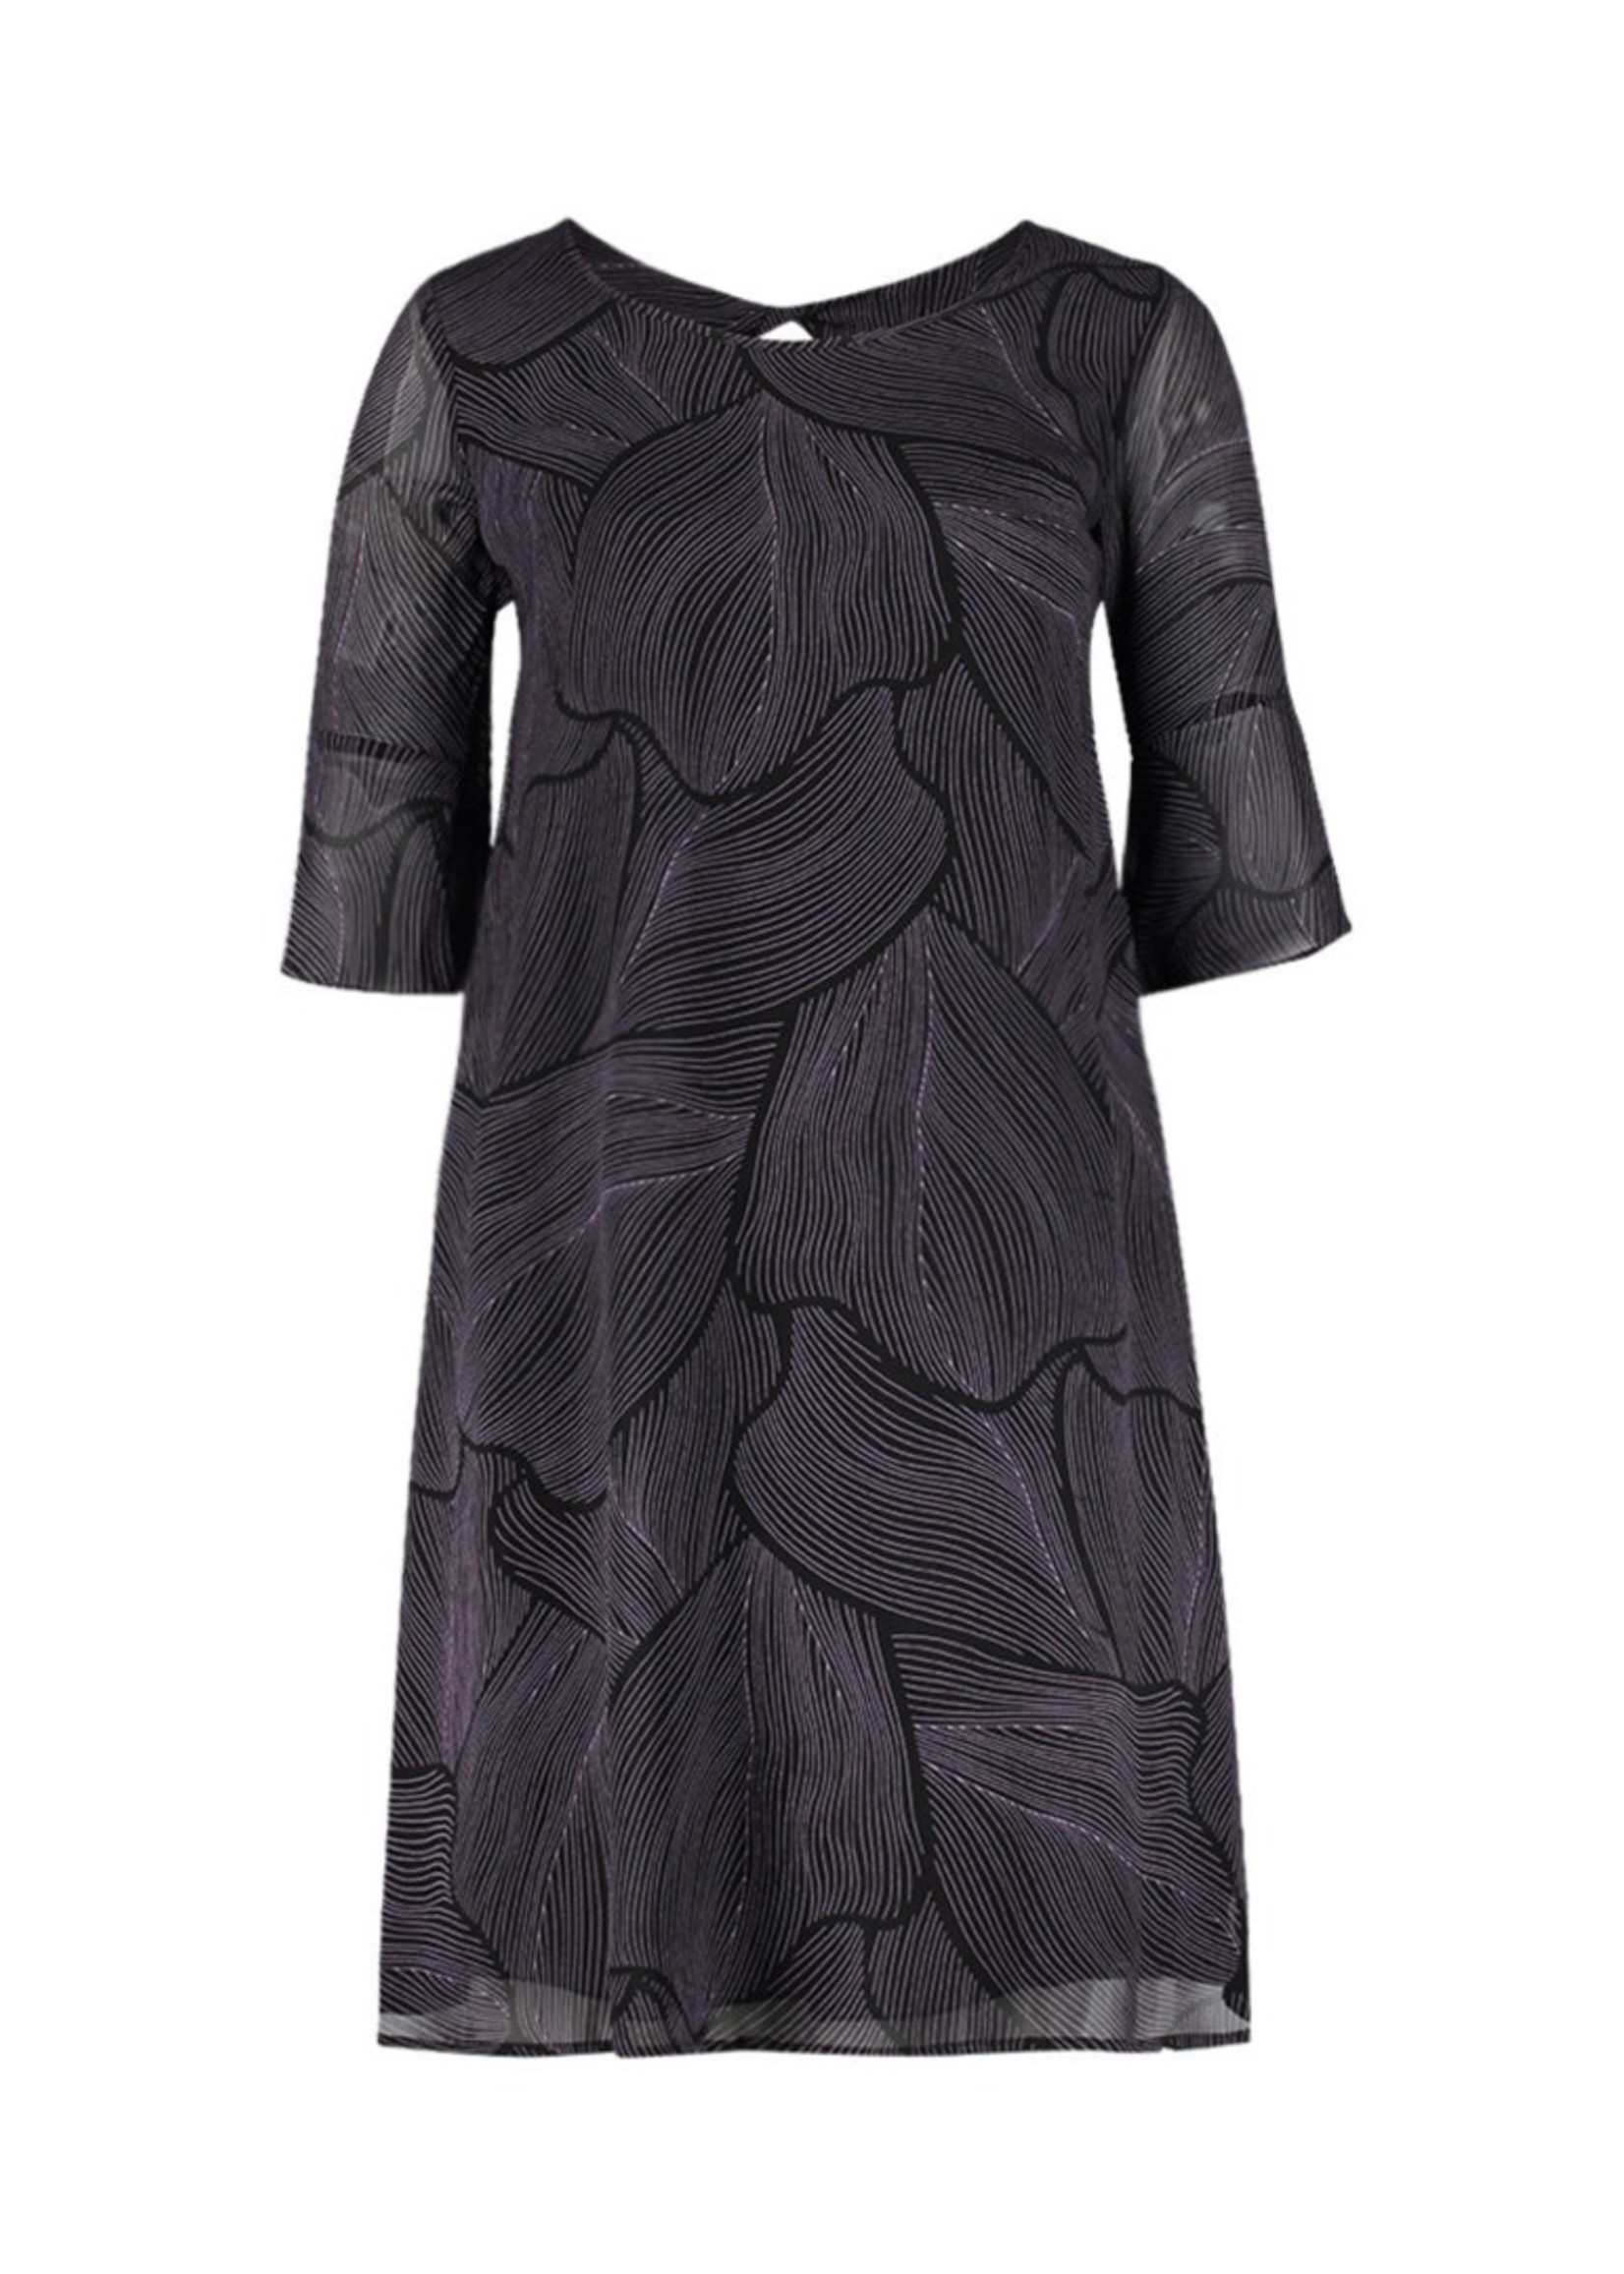 Ophilia Ophilia Viviane Dress